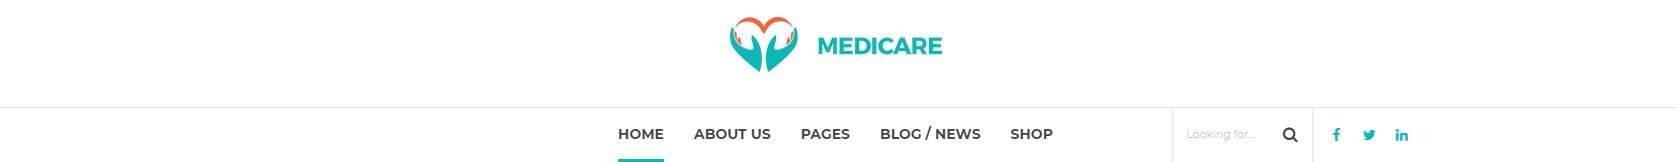 https://documentation.bold-themes.com/medicare/wp-content/uploads/sites/3/2018/03/menu-type-hCenterBelowLogo.jpg